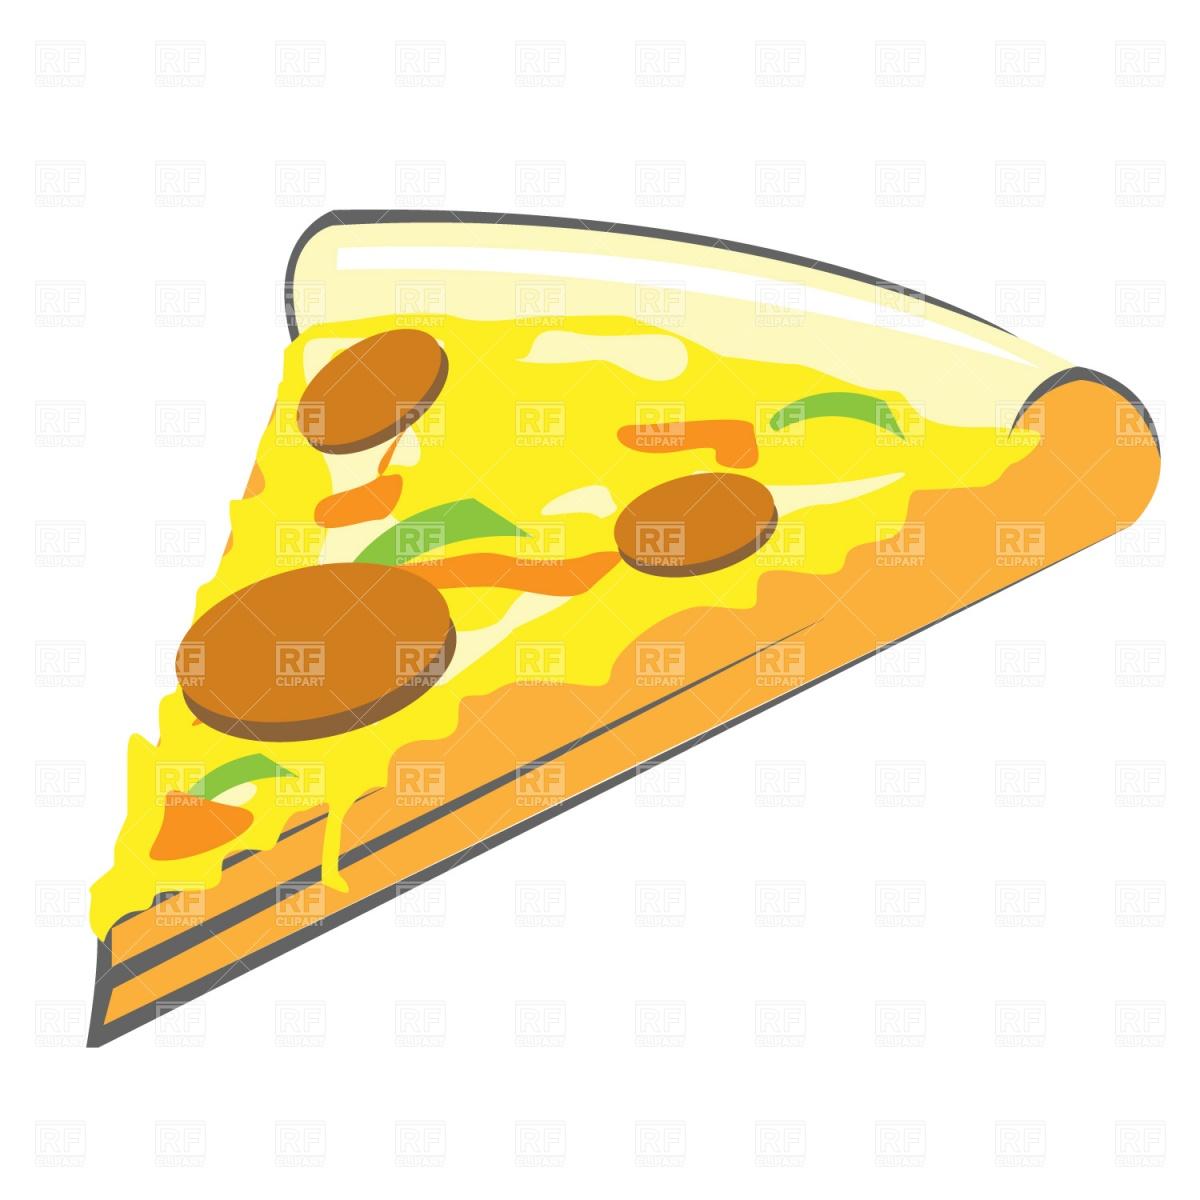 Pizza clipart blank Party Invitation Free Pizza blank%20pizza%20party%20invitation